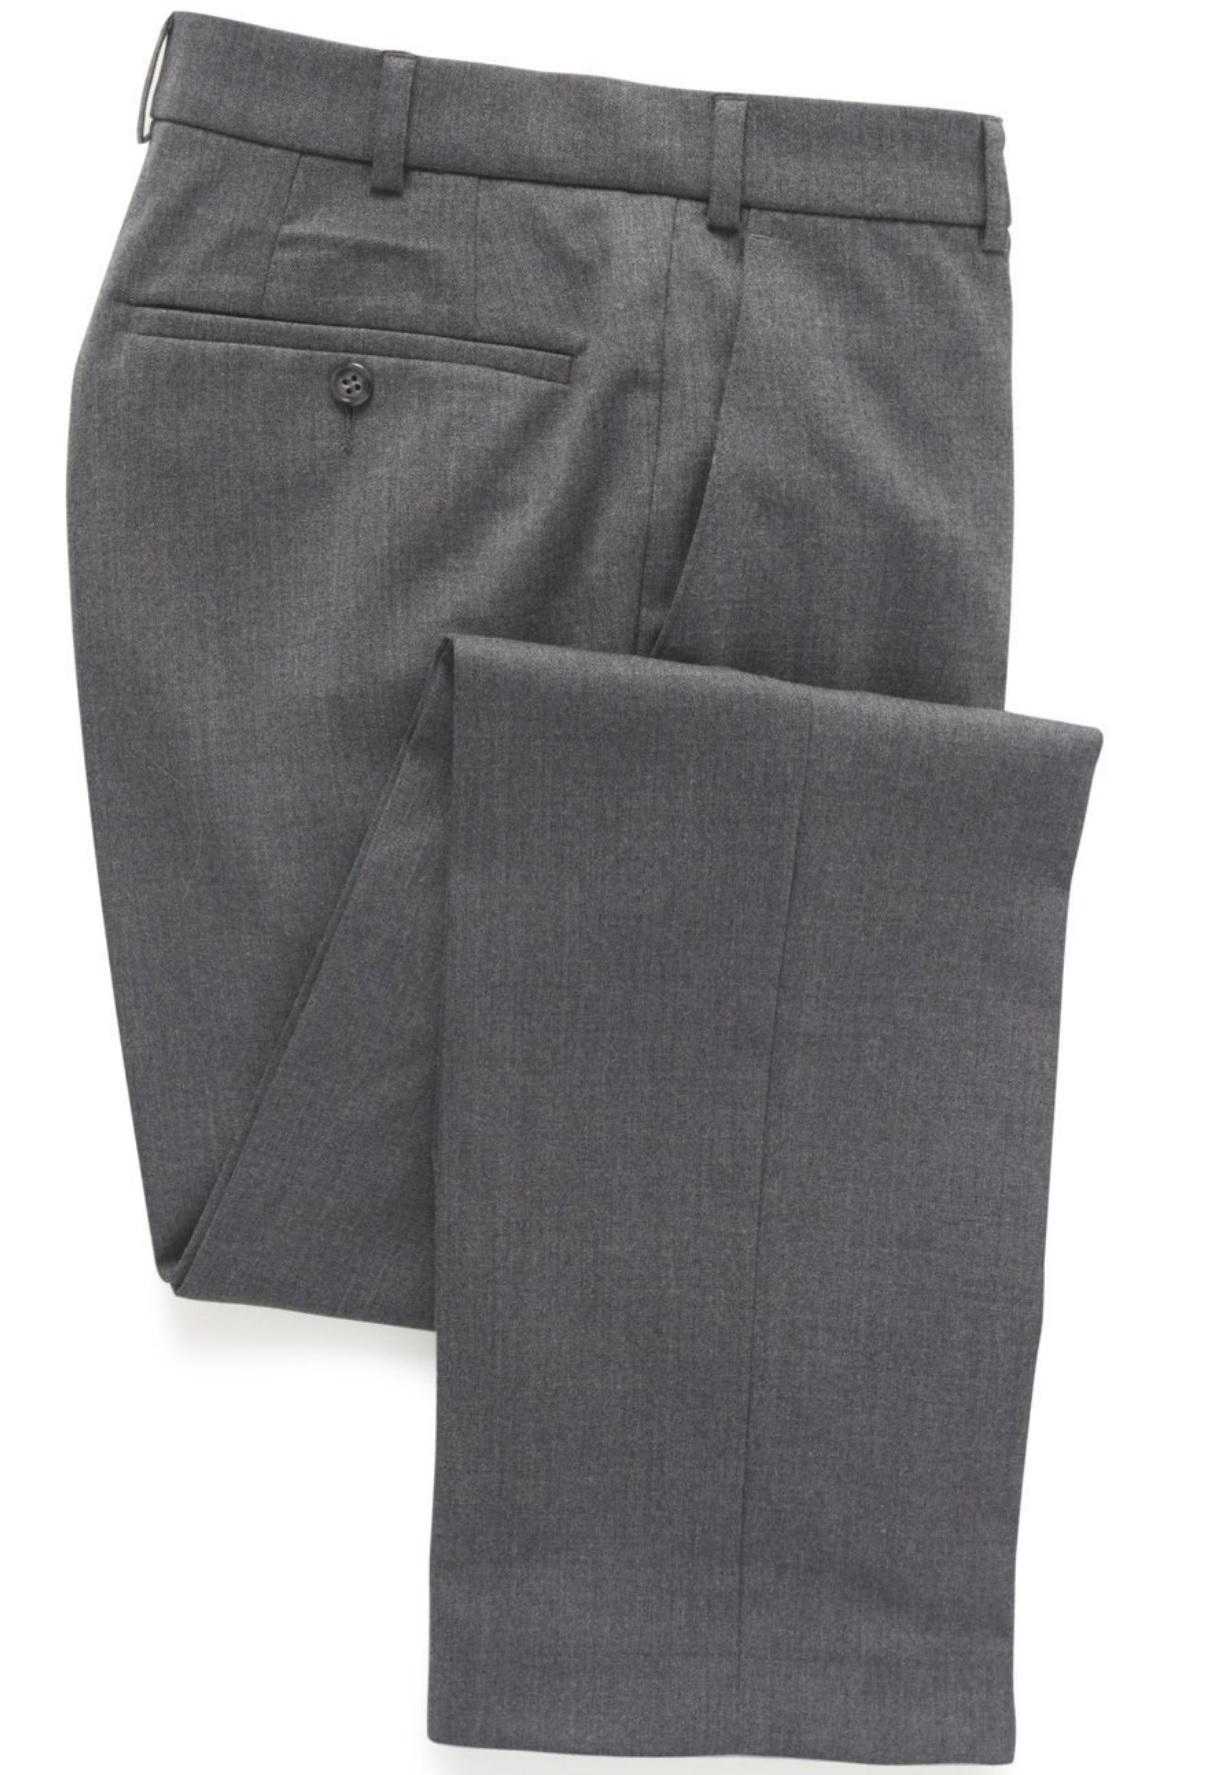 velklædt grå bukser pæn i tøjet